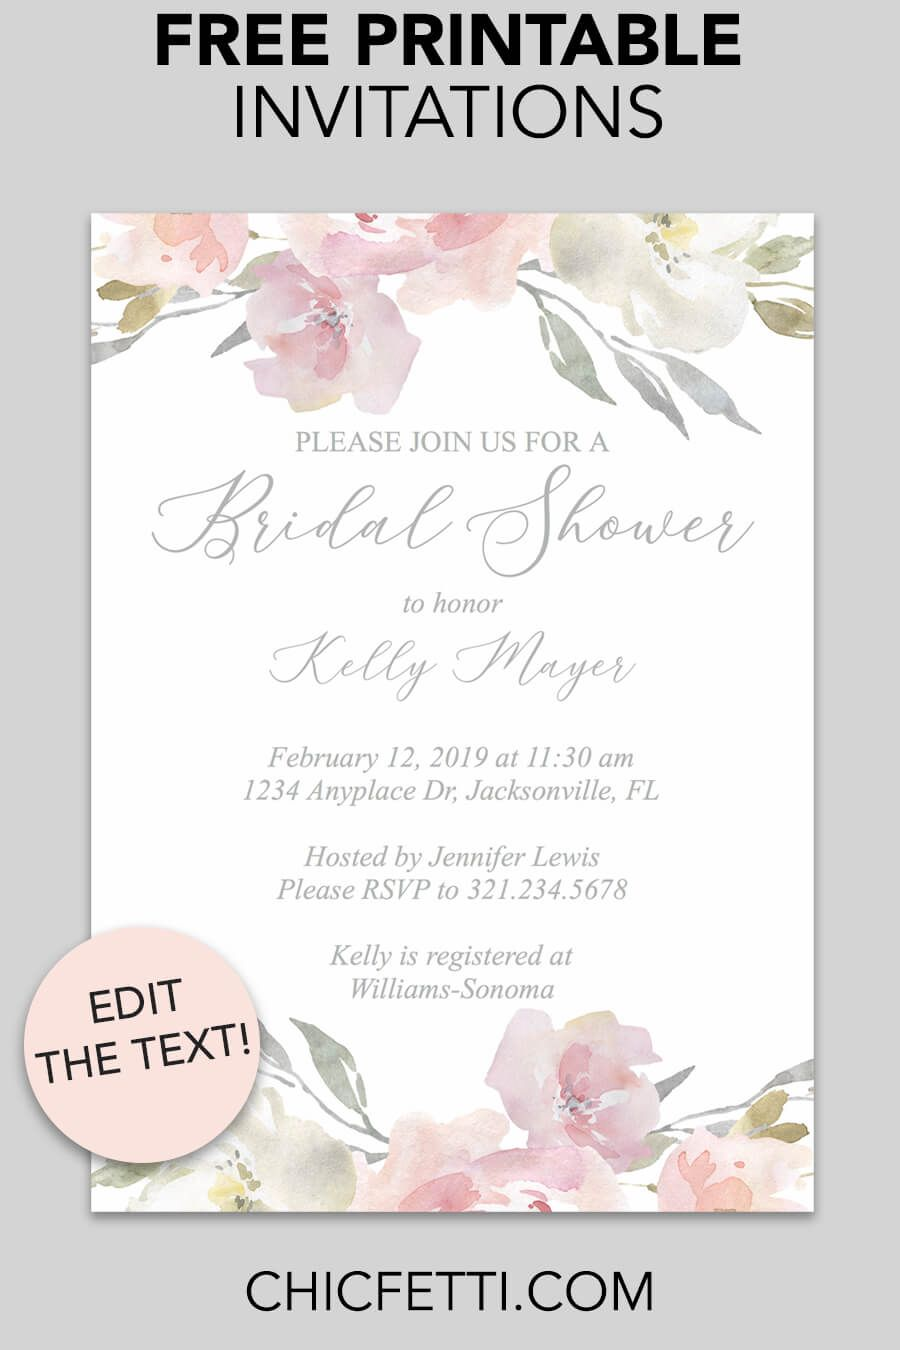 Printable Bridal Shower Invitations Templates Free